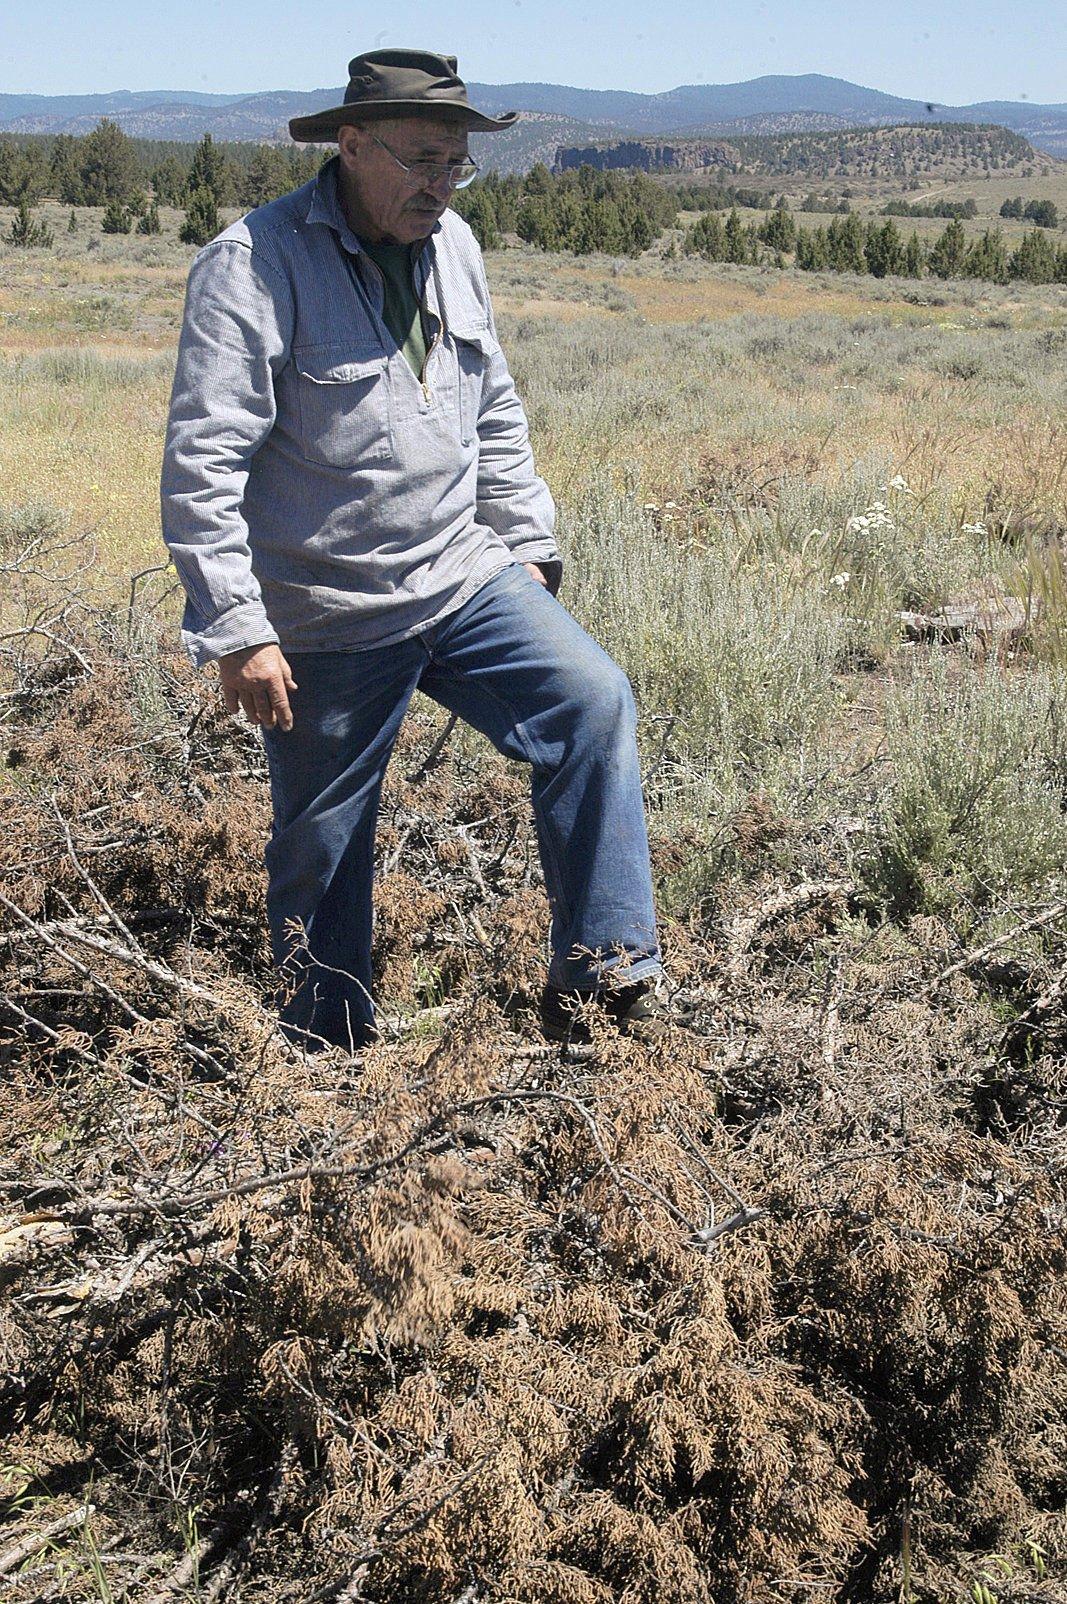 In Central Oregon, landscape benefits from removing juniper trees